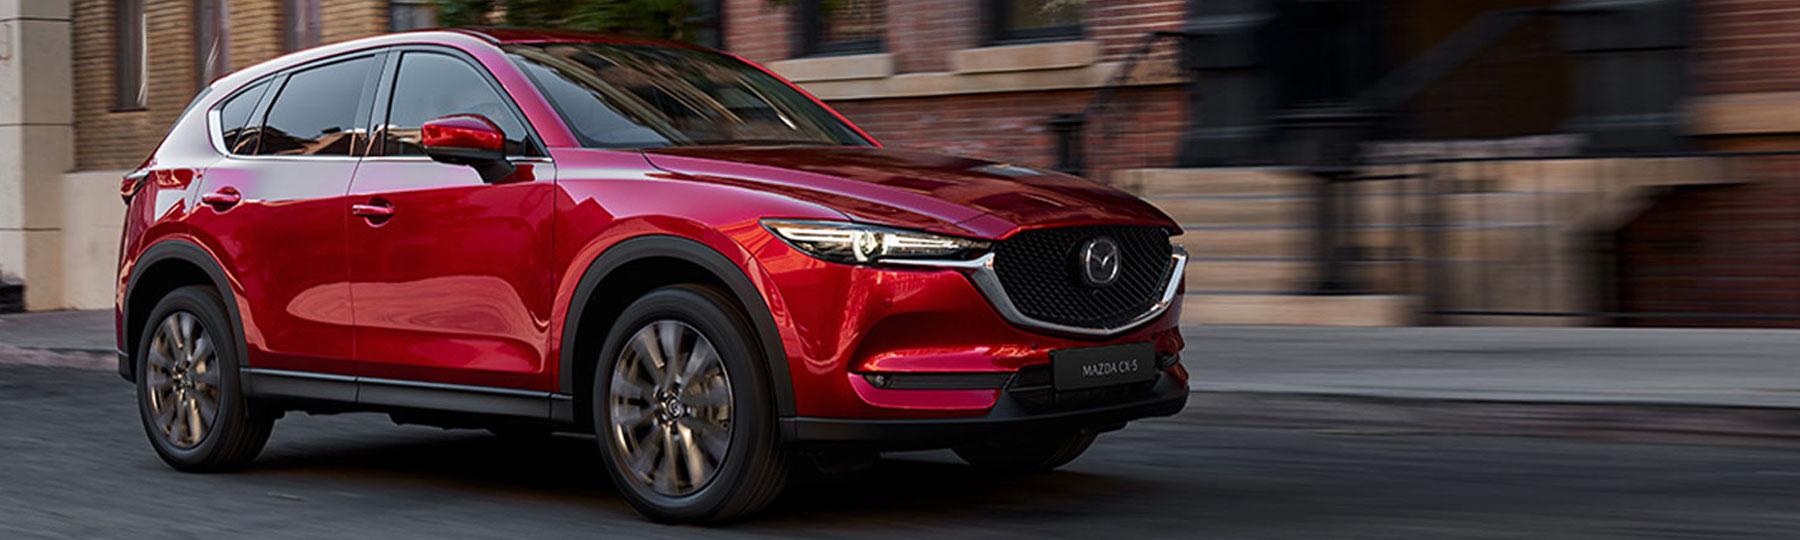 mazda CX 5 New Car Offer